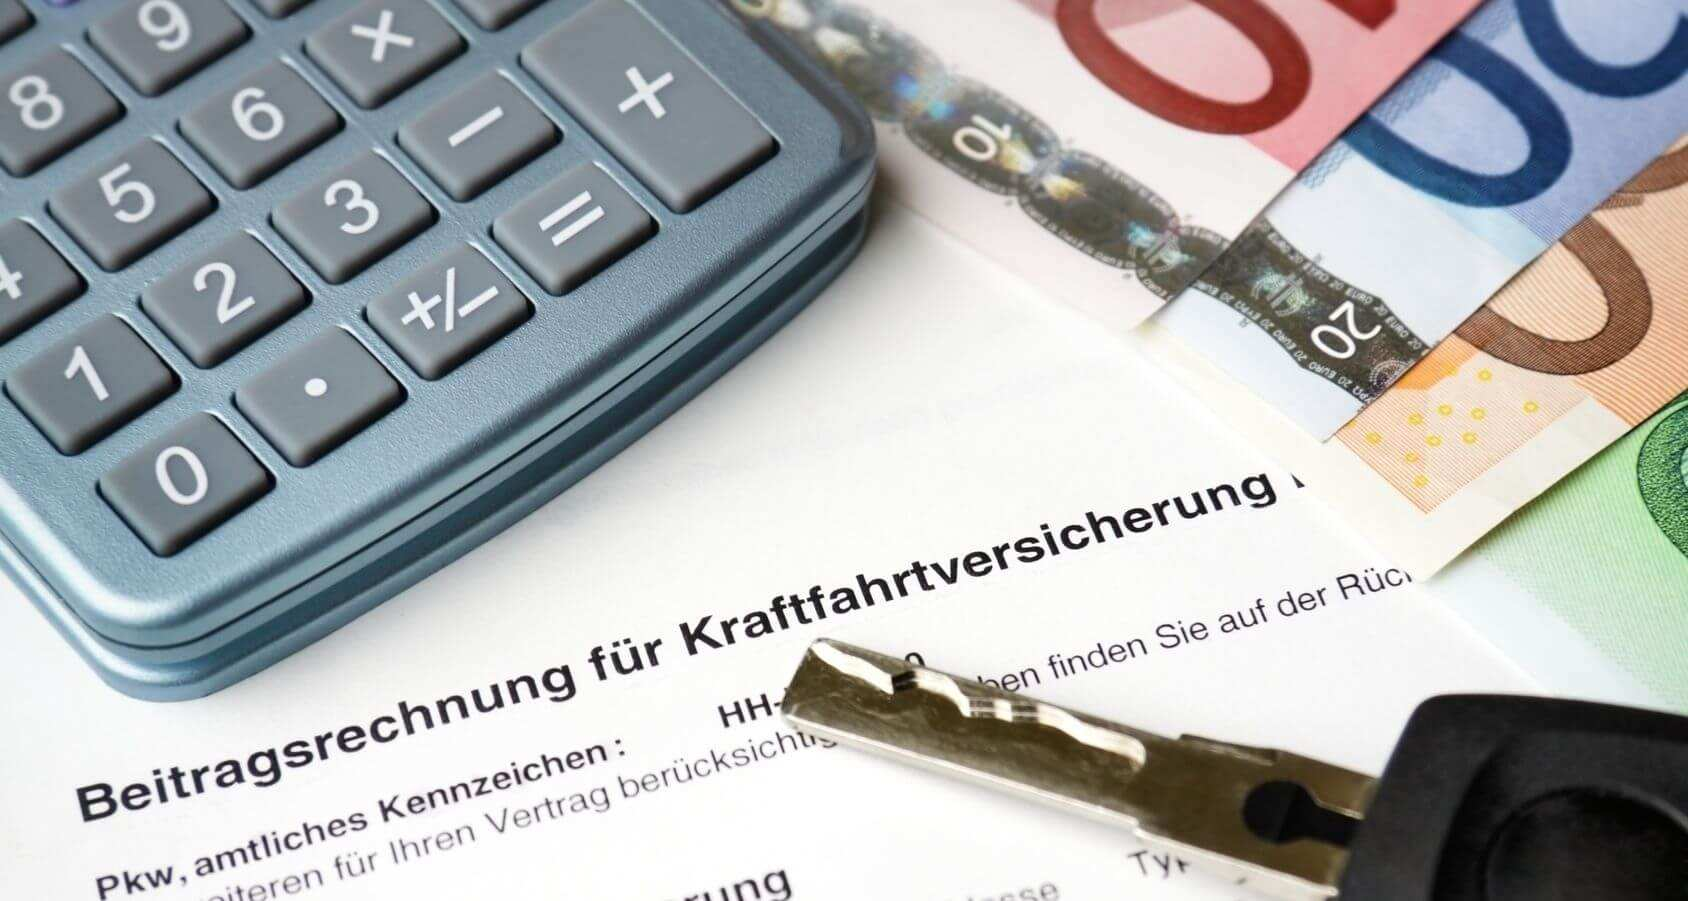 Lvm Kfz Versicherung Kundigen Geht Nur Per Post Oder Fax